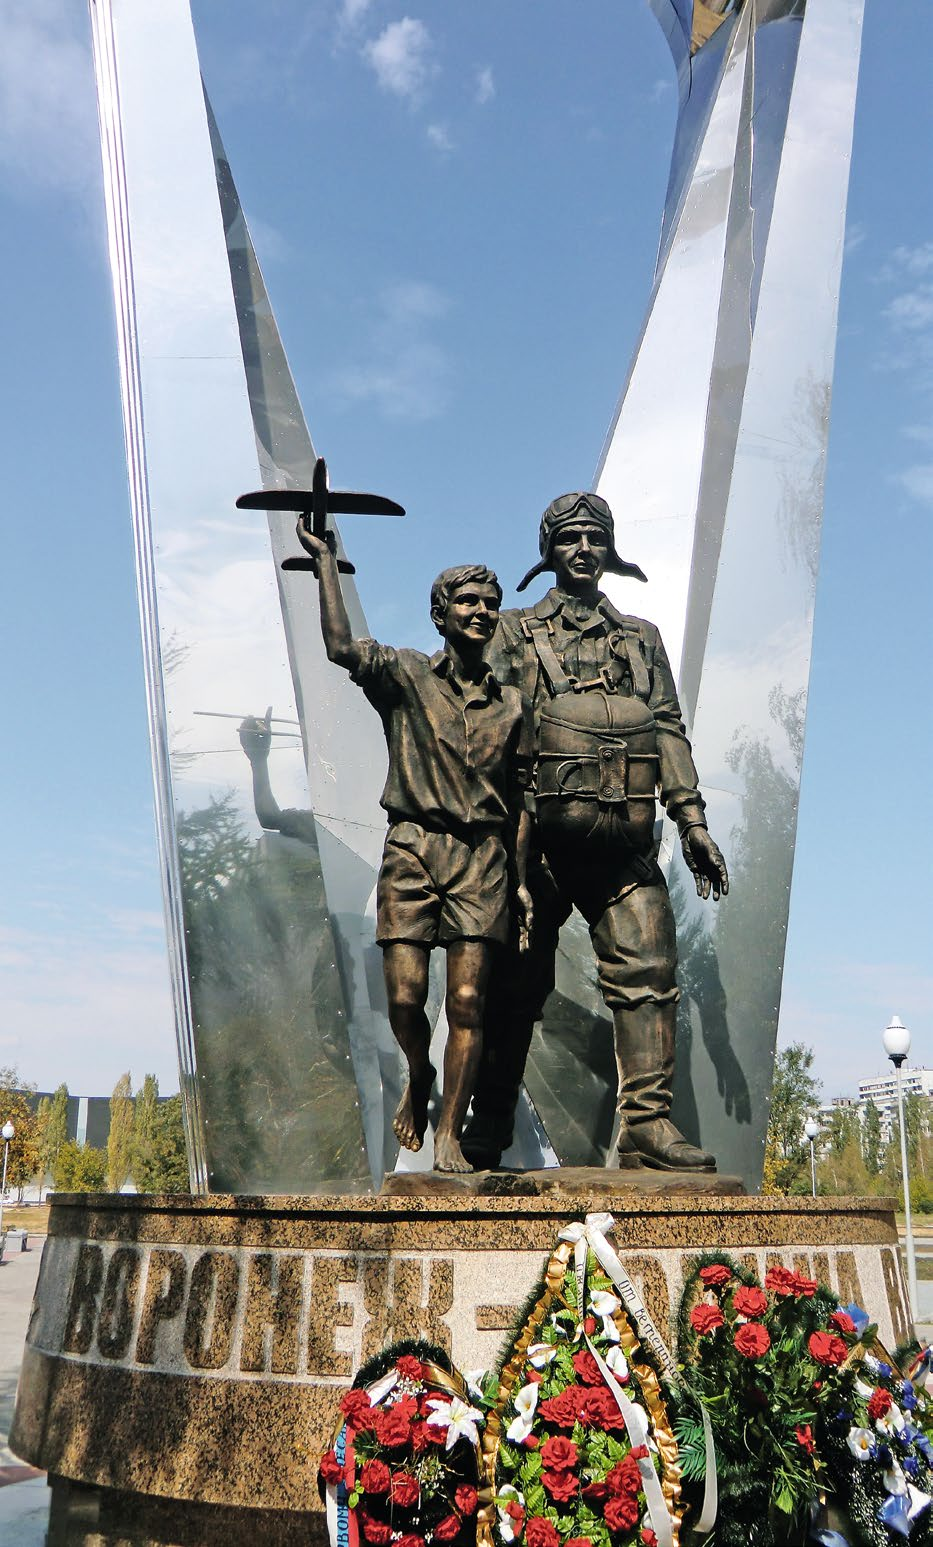 Памятник десантникам «Воронеж – Родина ВДВ» в Воронеже